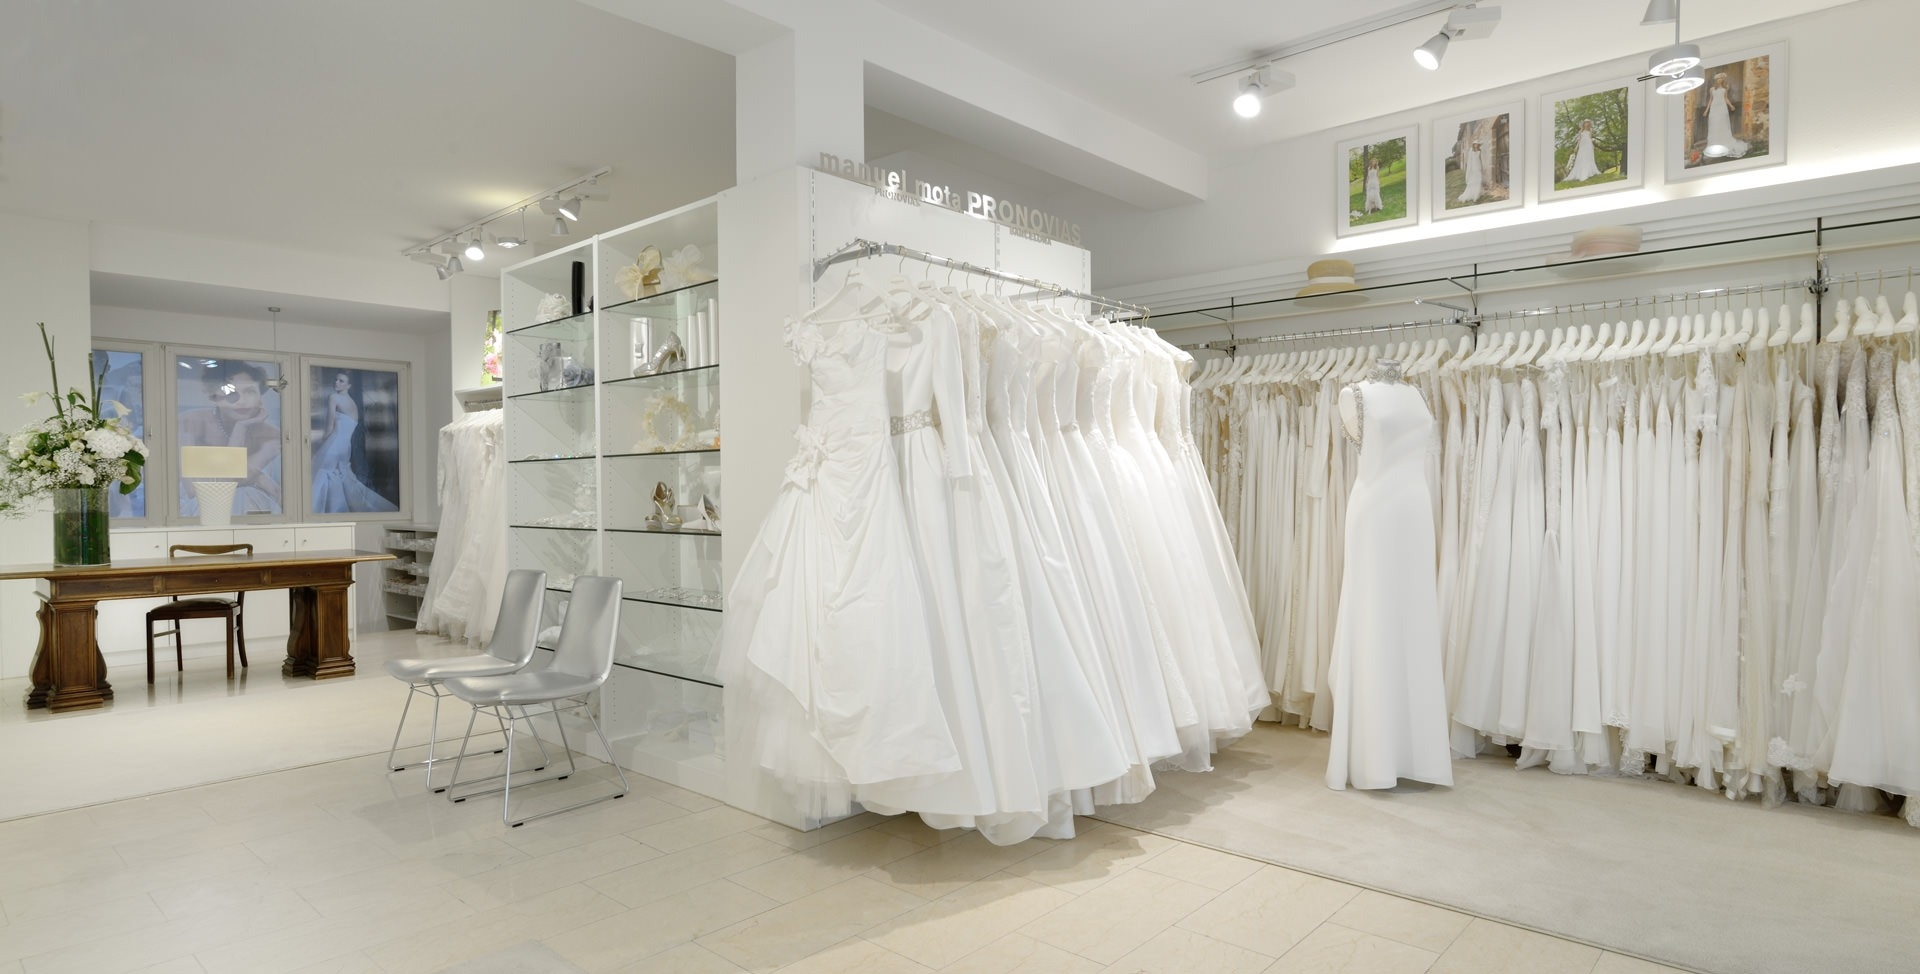 13 Fantastisch Brautmodengeschäft BoutiqueAbend Cool Brautmodengeschäft Spezialgebiet